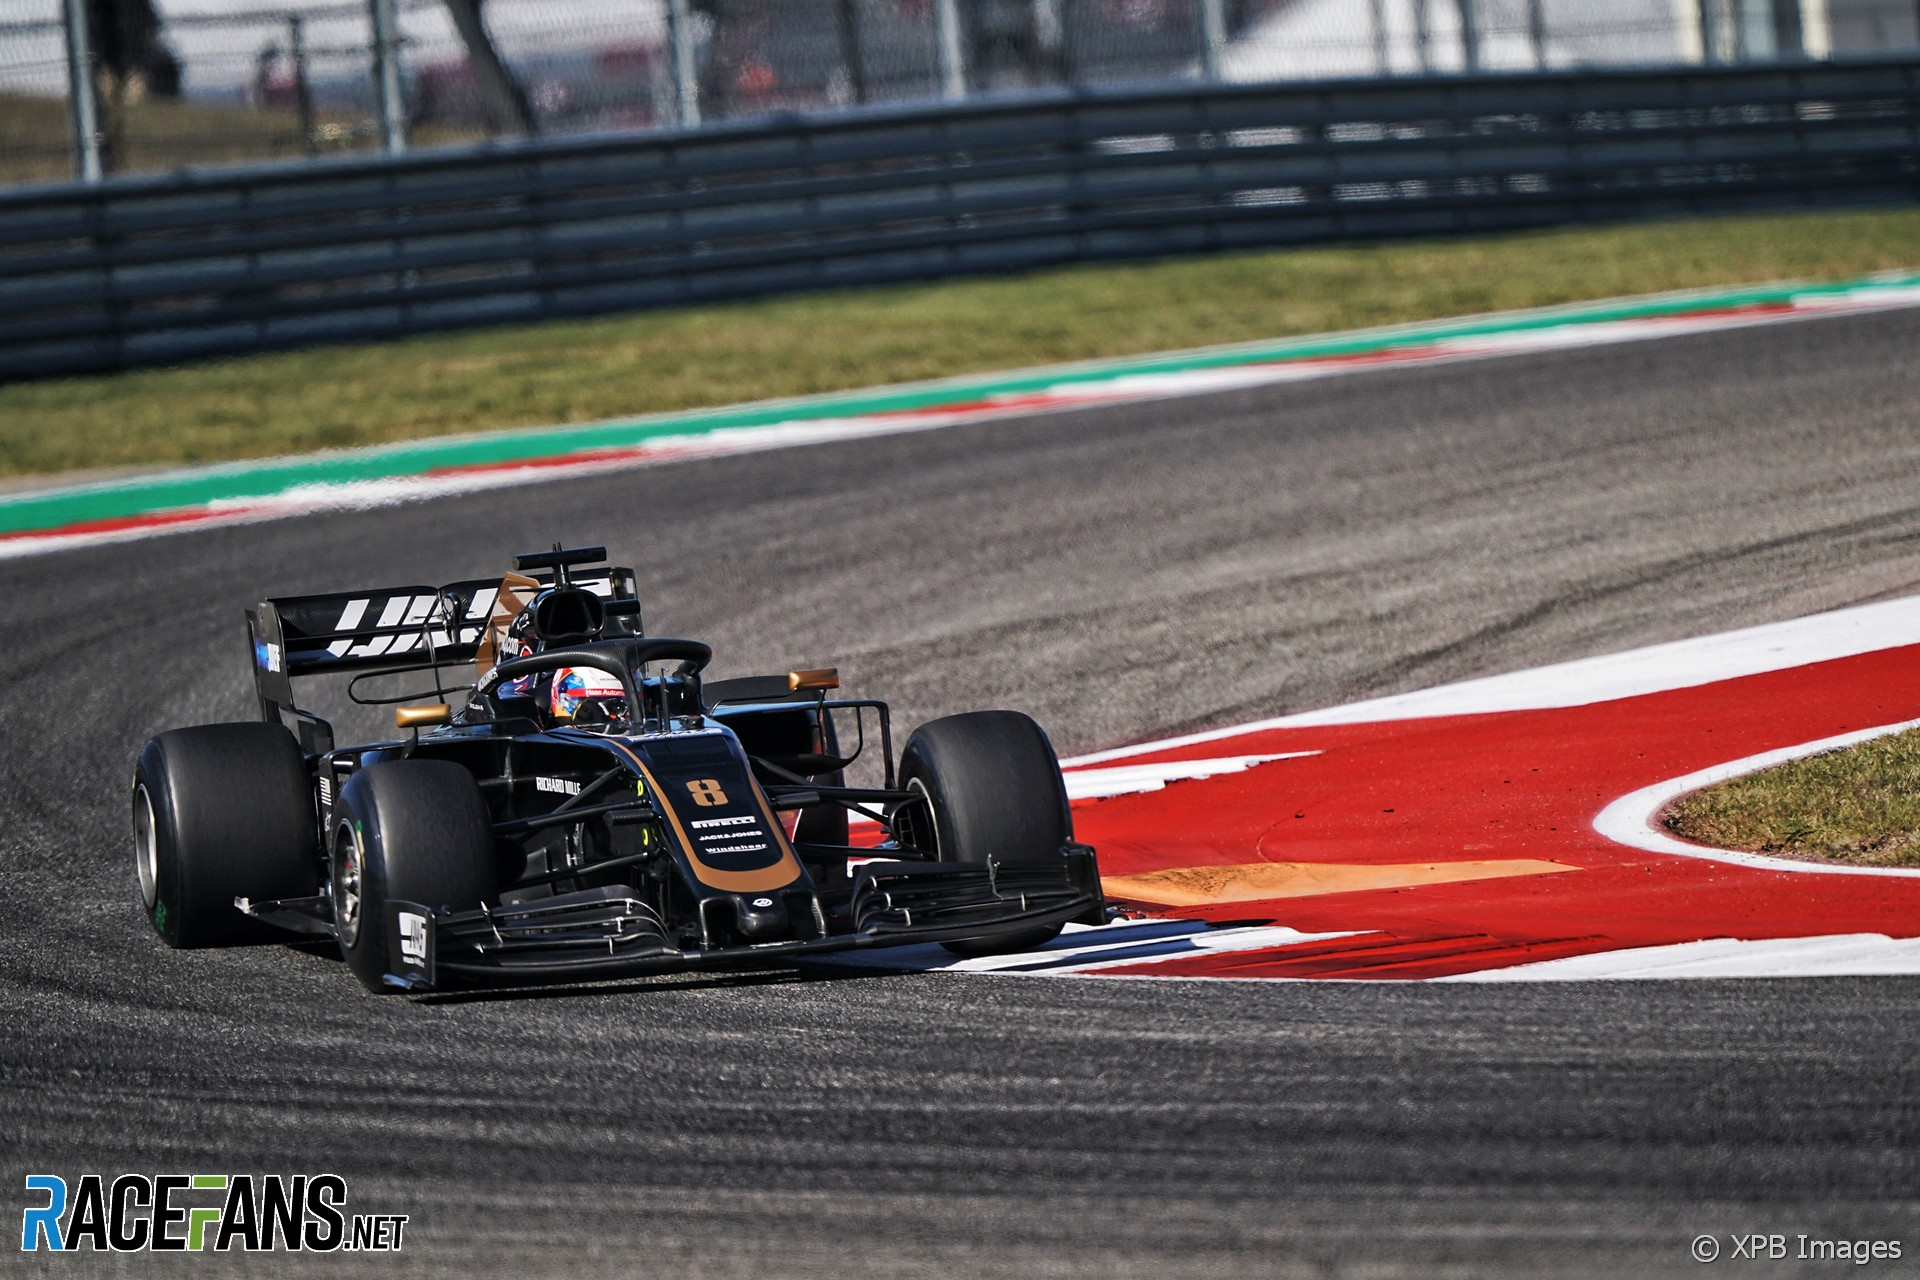 Romain Grosjean, Haas, Circuit of the Americas, 2019